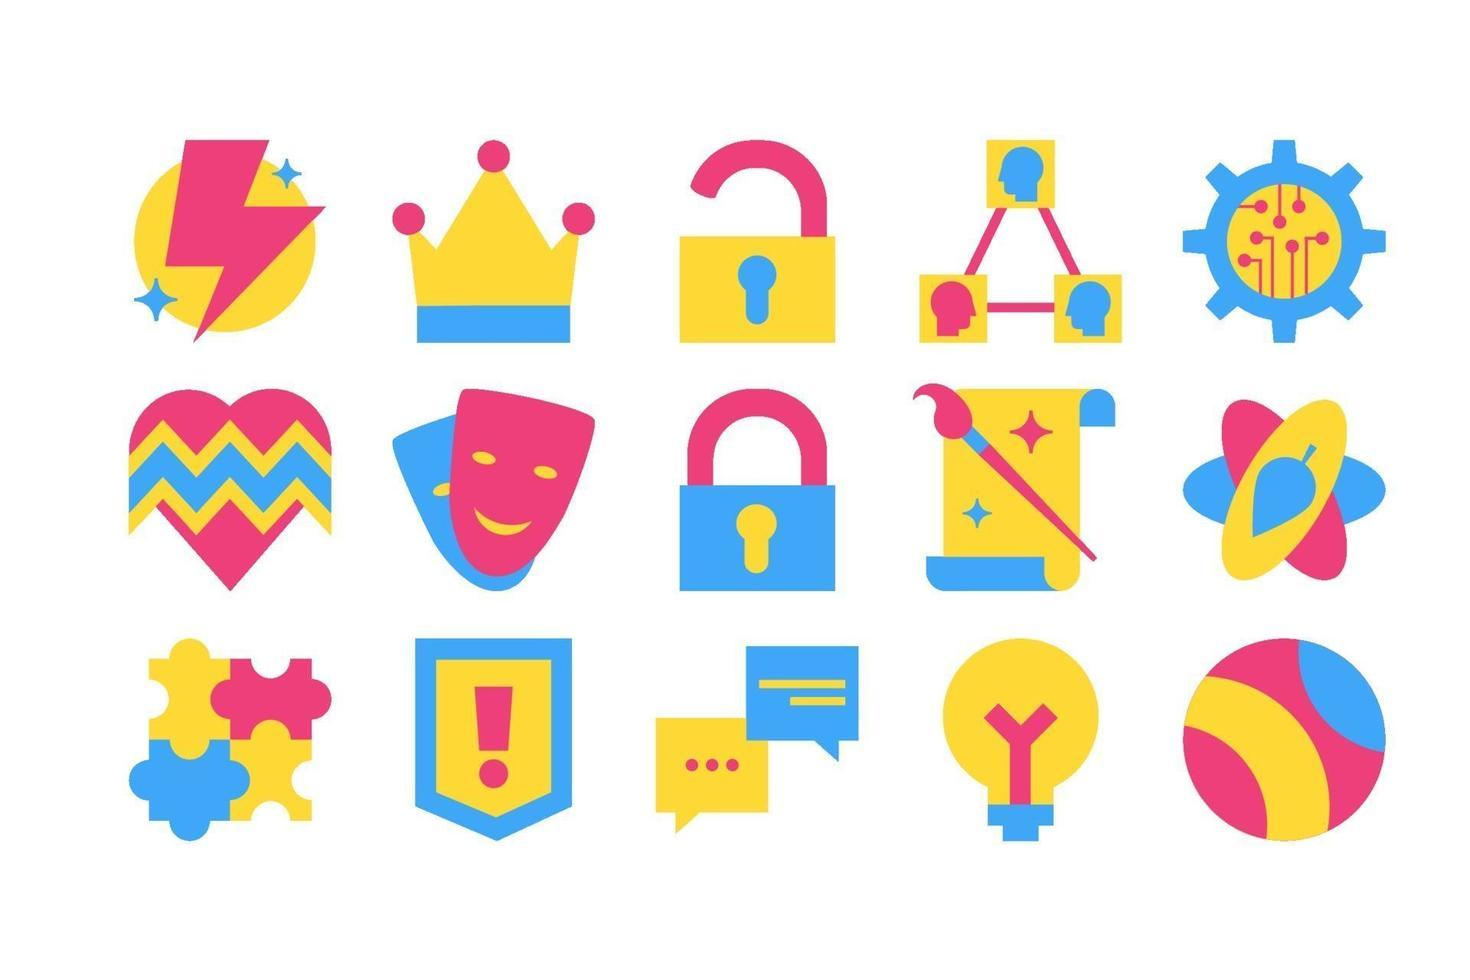 samling av olika kreativa design ikonen vektor